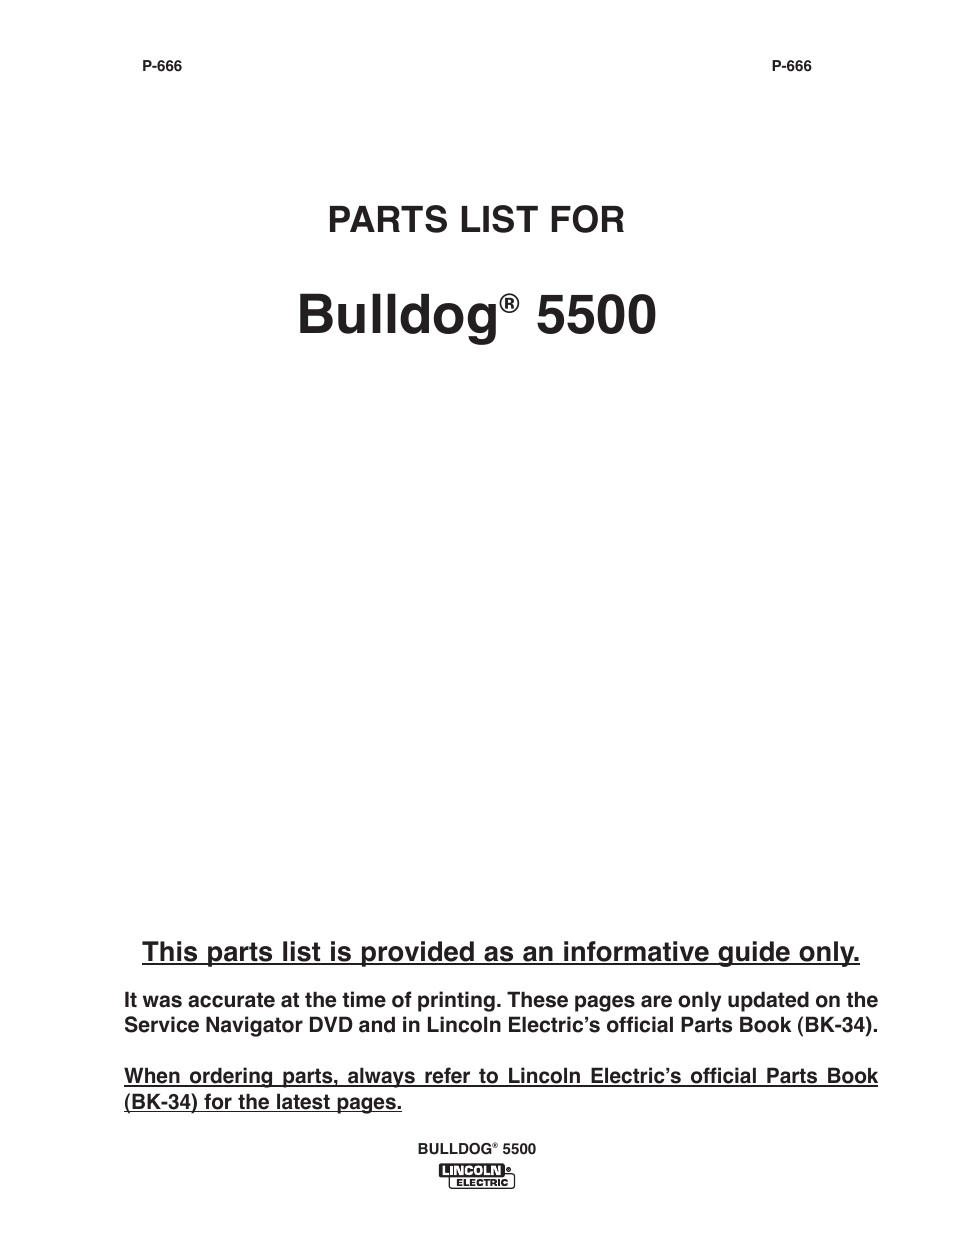 medium resolution of bulldog parts list for lincoln electric im10074 bulldog 5500 user manual page 43 56